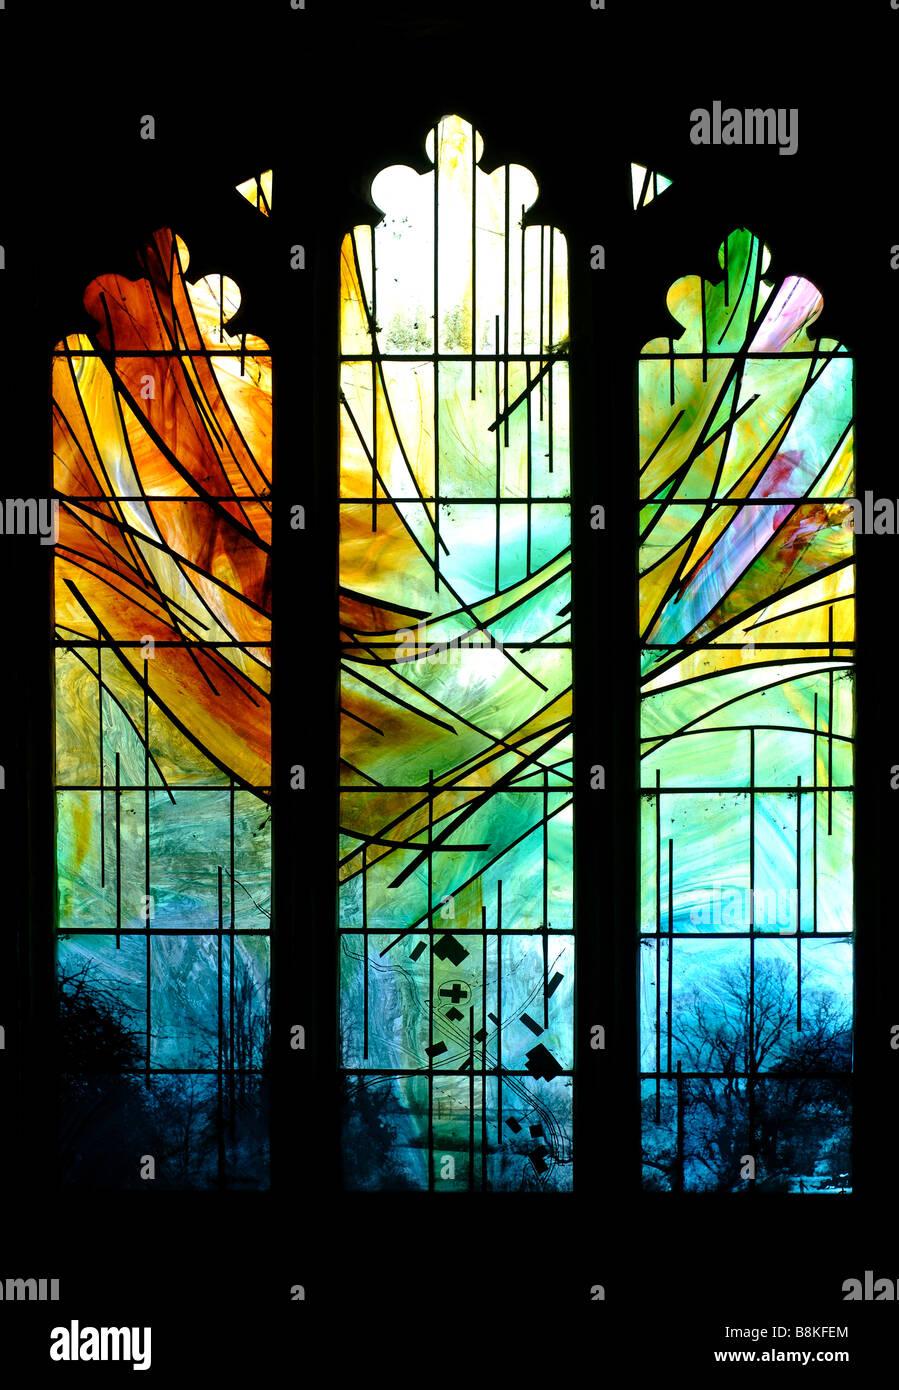 Millennium window, St. Michael and All Angels Church, Winwick, Northamptonshire, England, UK - Stock Image